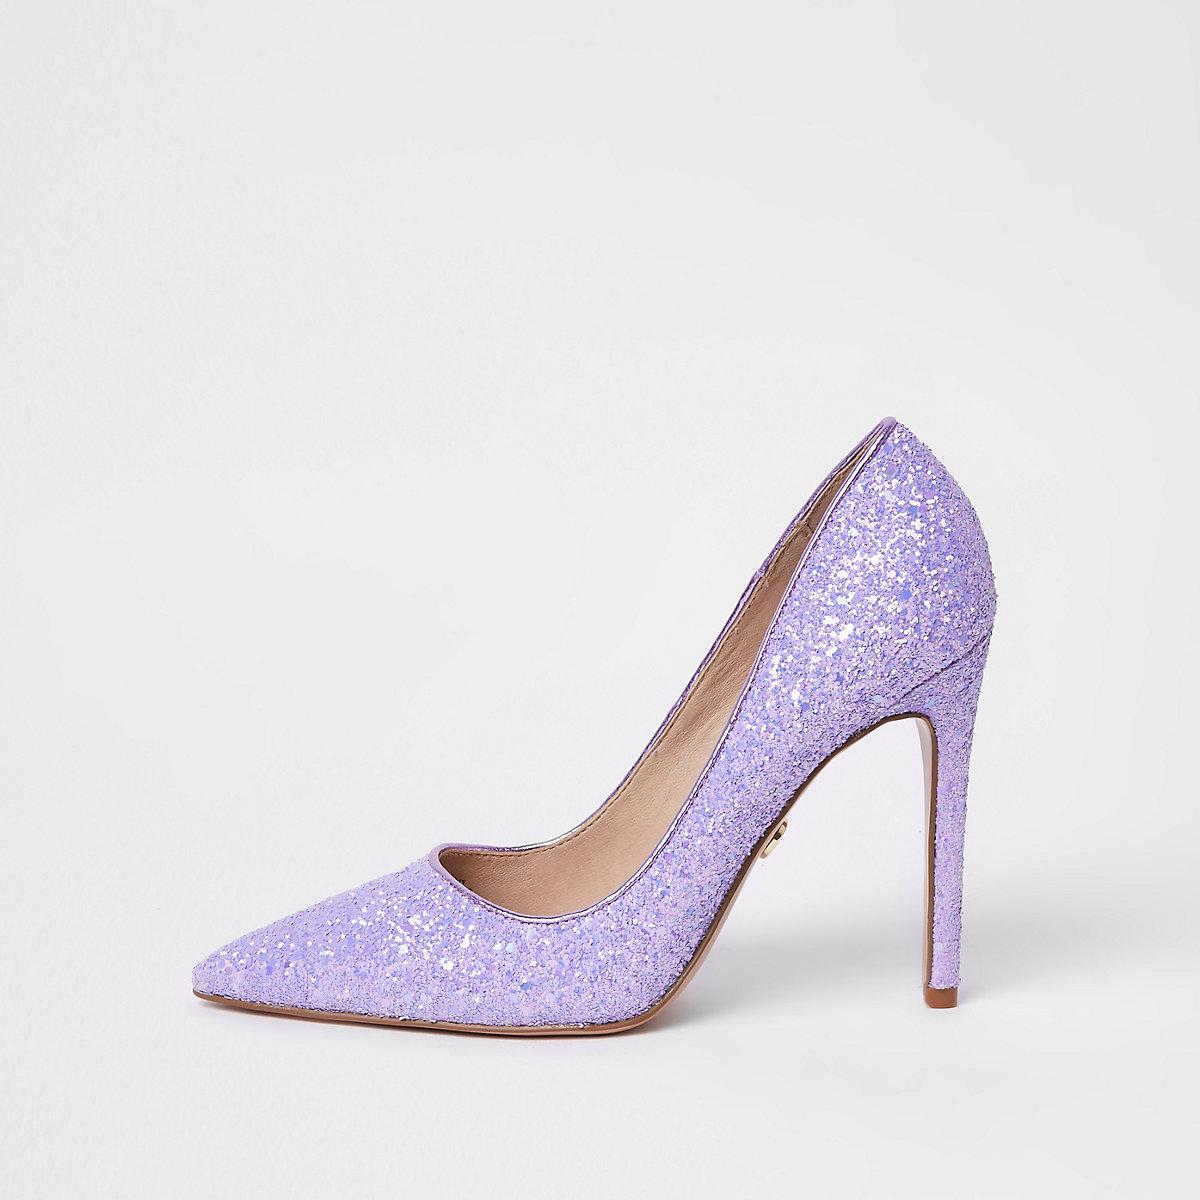 Purple glitter pumps